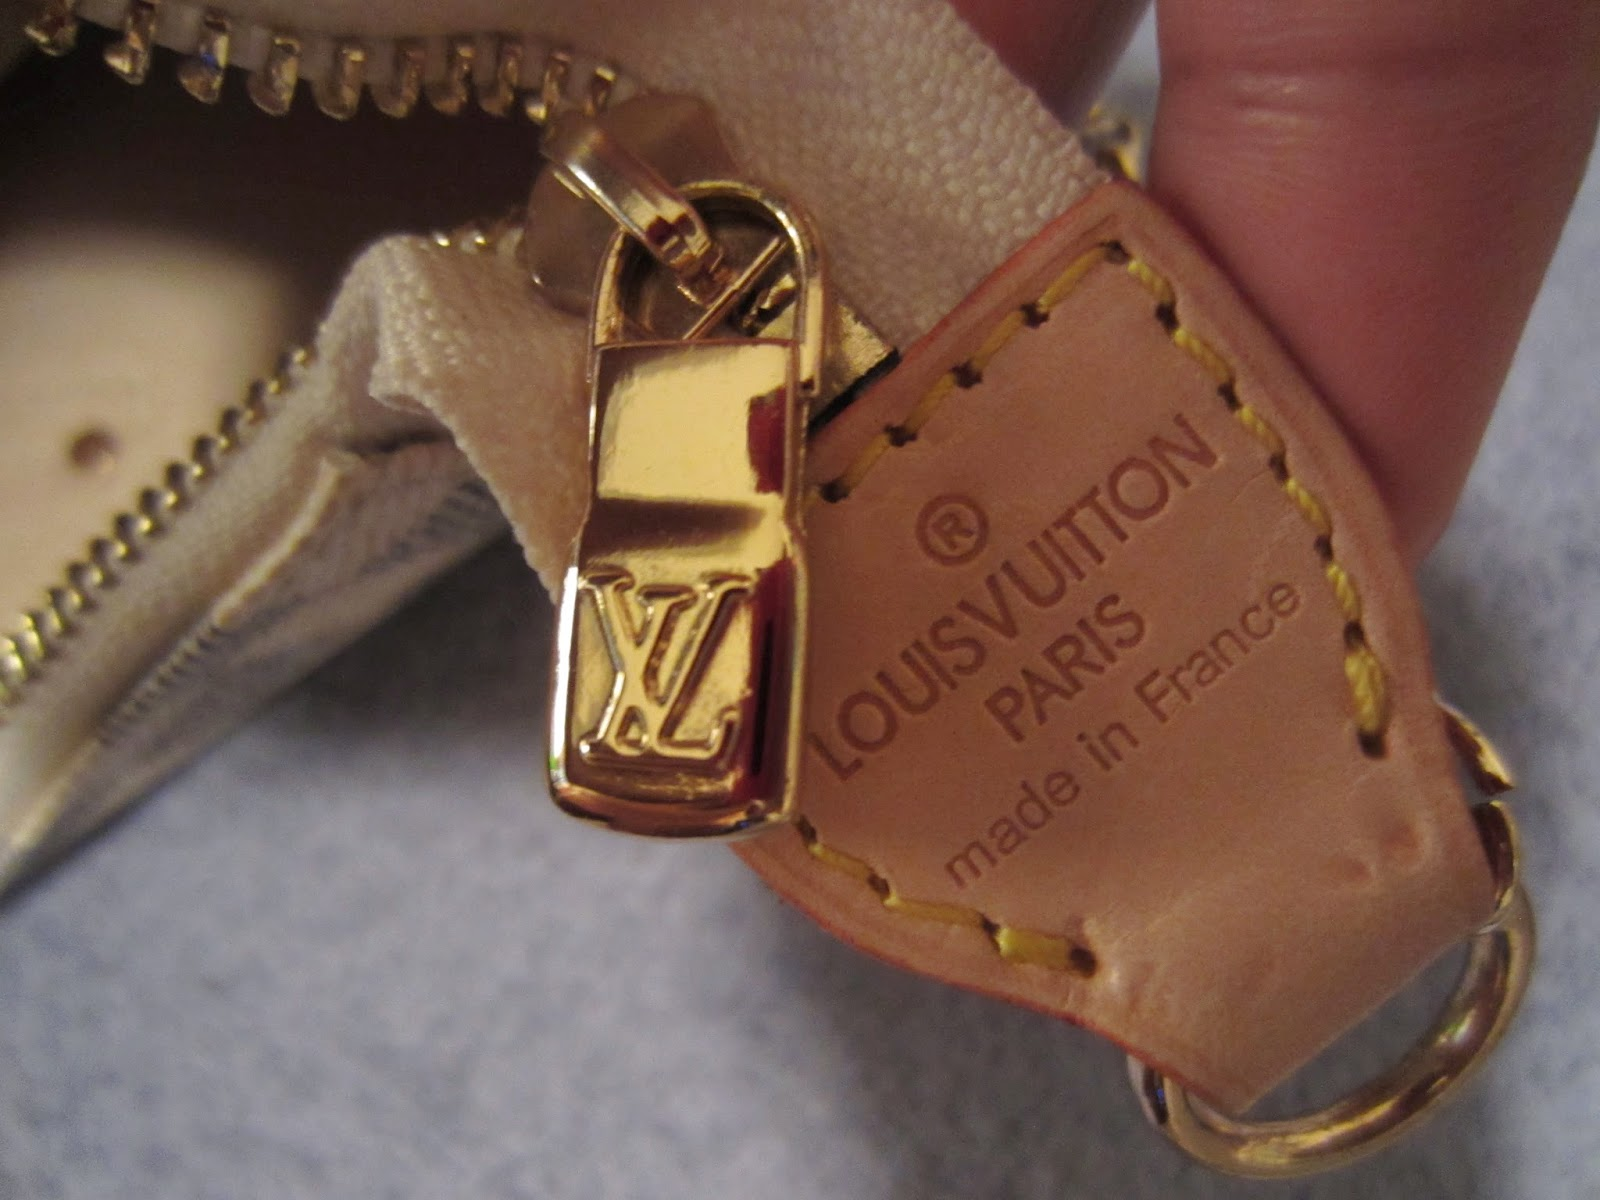 leather monogrammed clutch - Louis Vuitton: Replica Eva Clutch (Damier Azur) | NicoleMckoy